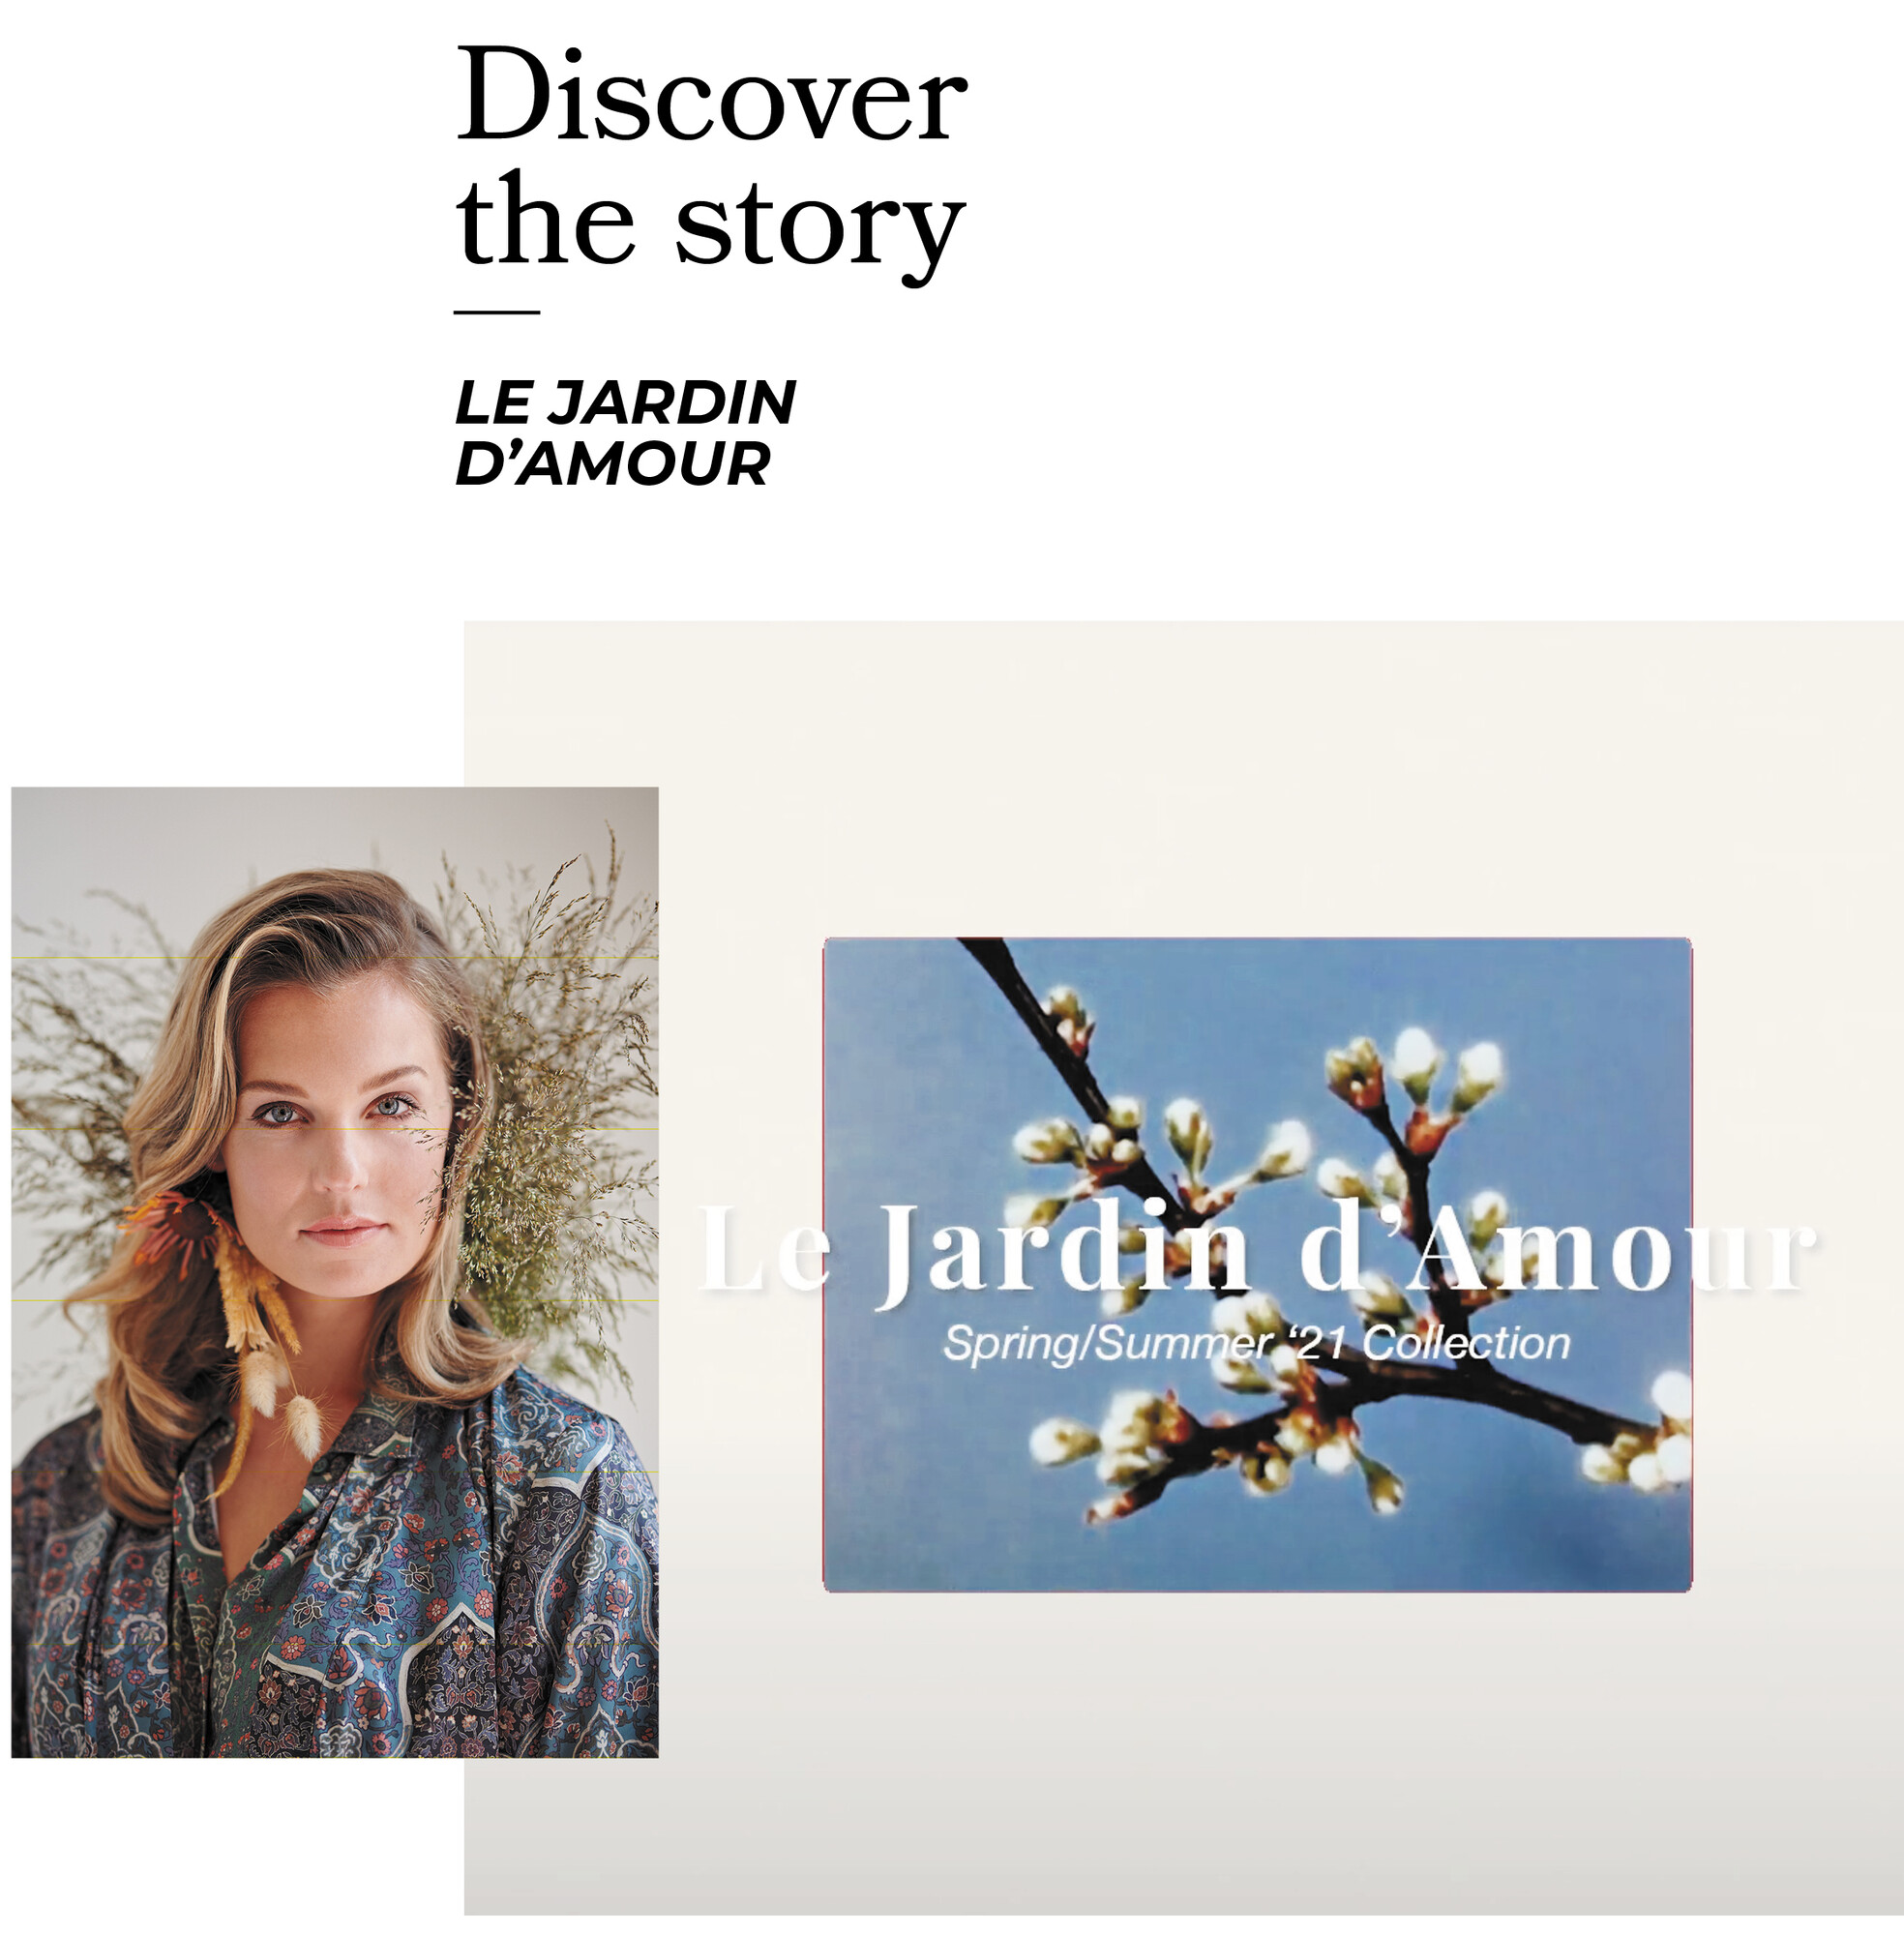 Le Jardin d'Amour Collection movie